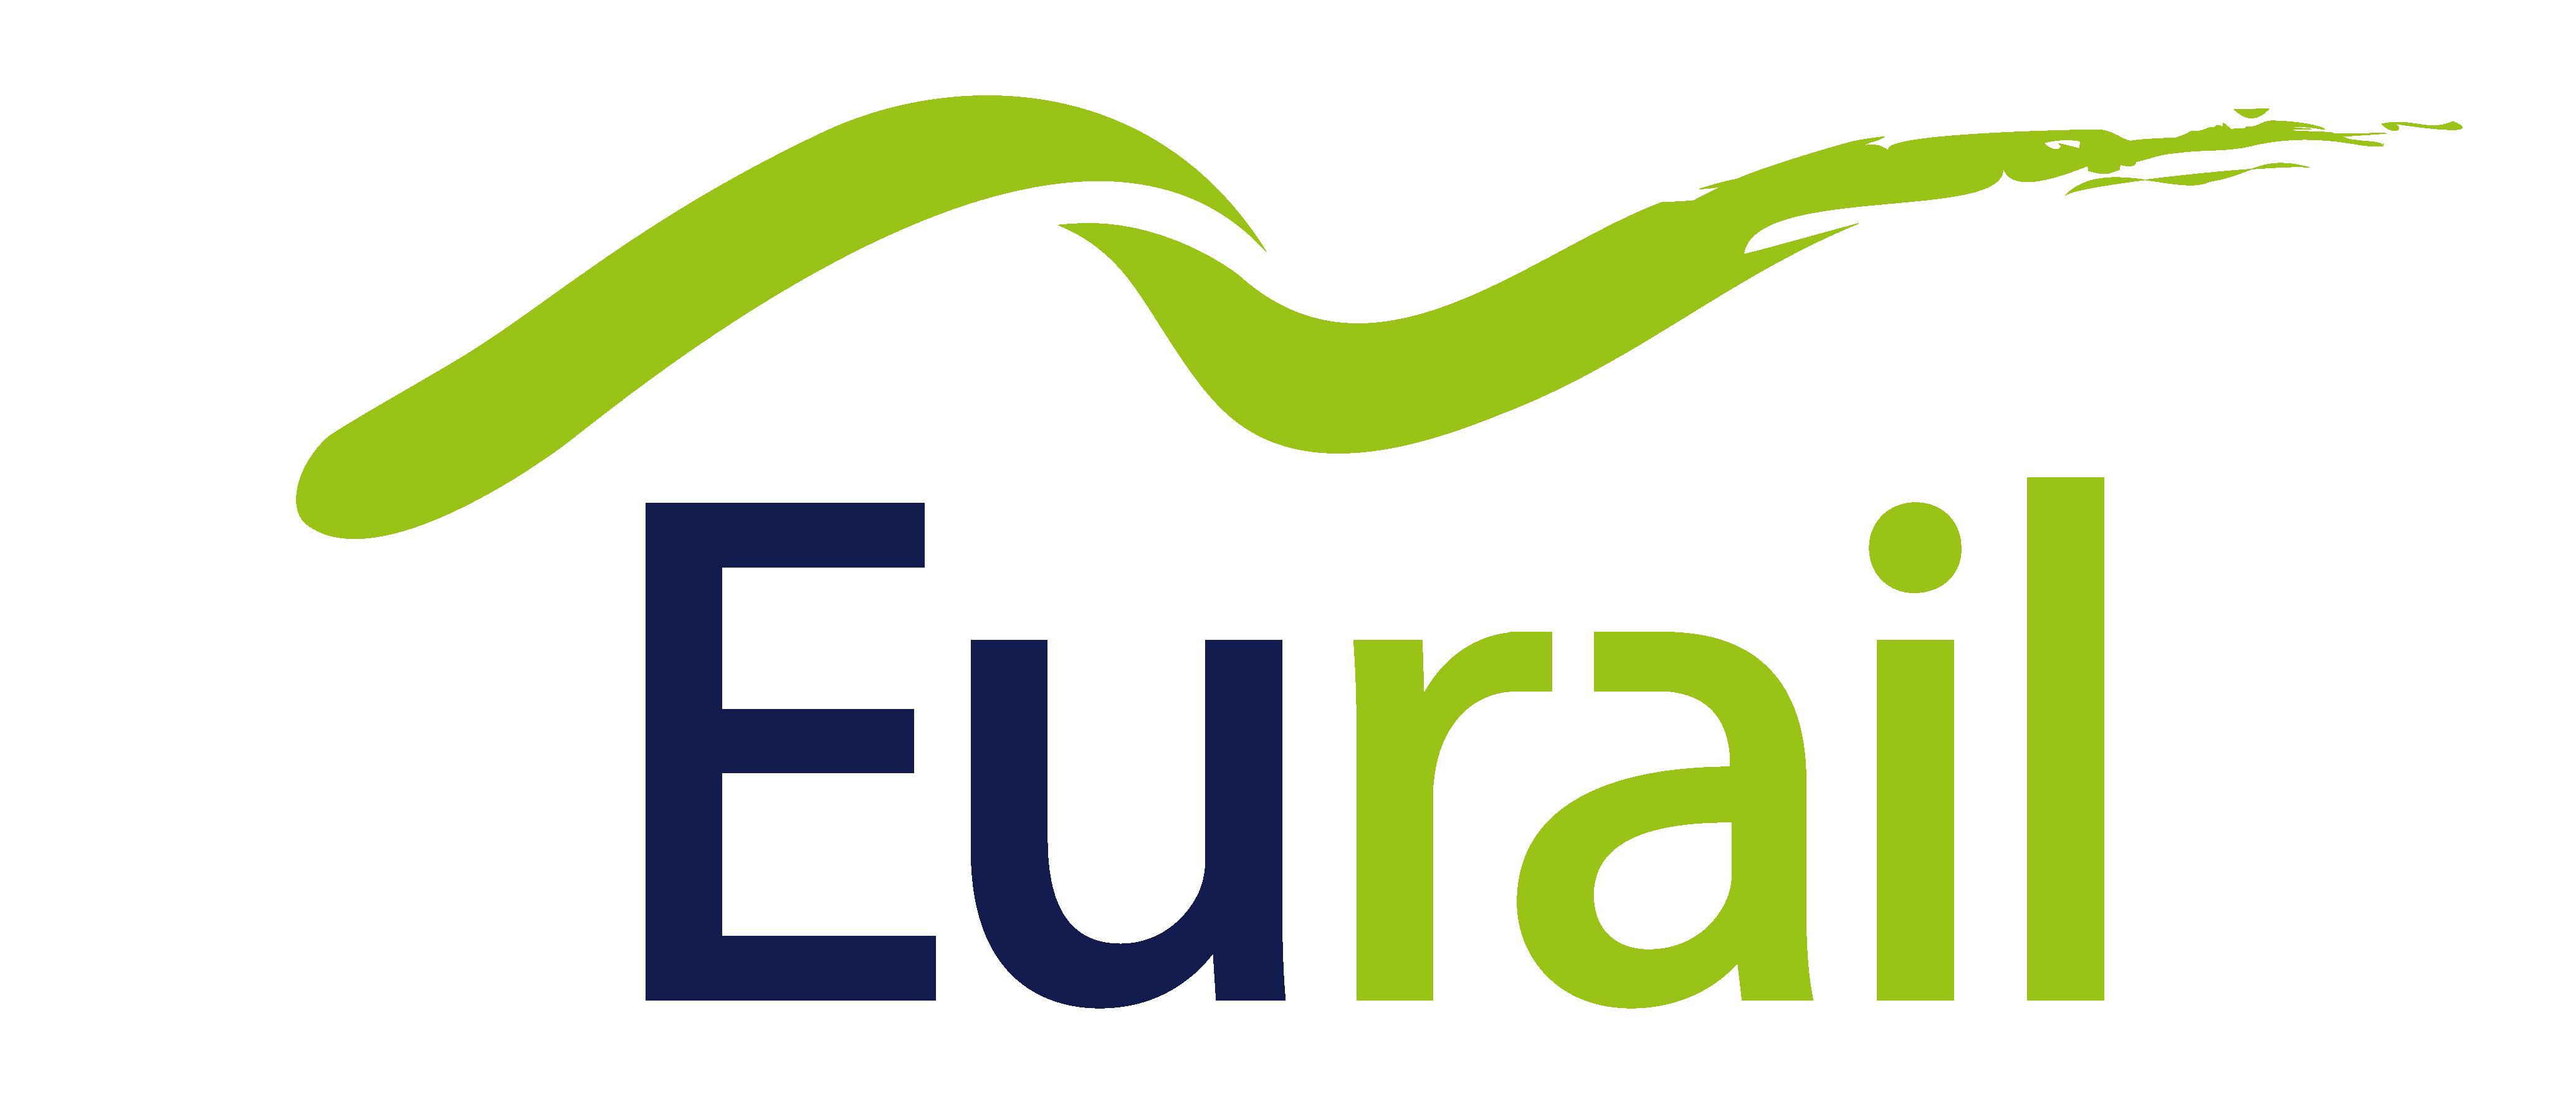 Interrail and eurail pass. Tickets clipart train ticket